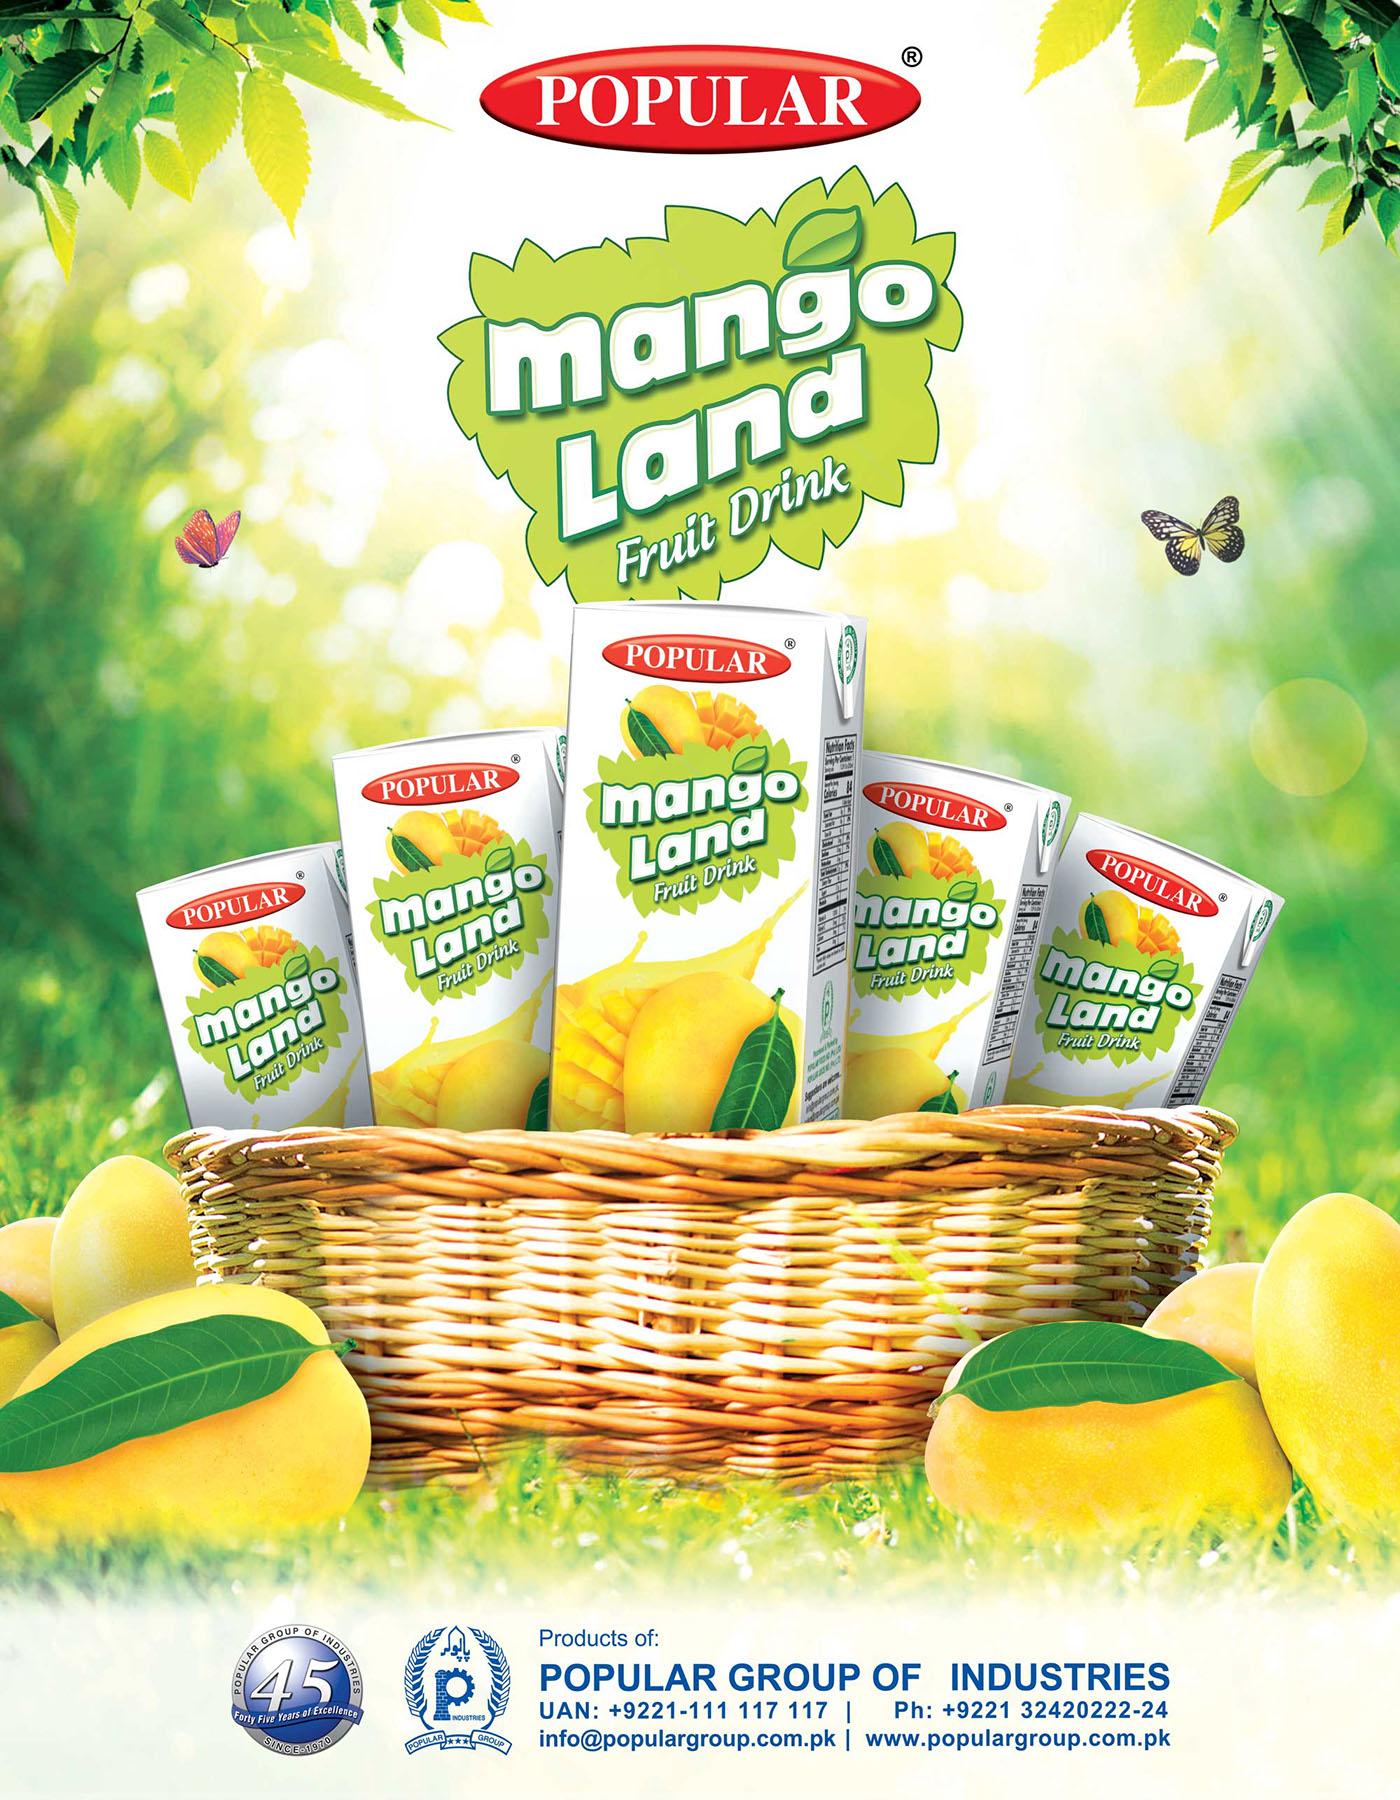 Mango land Poster on Behance